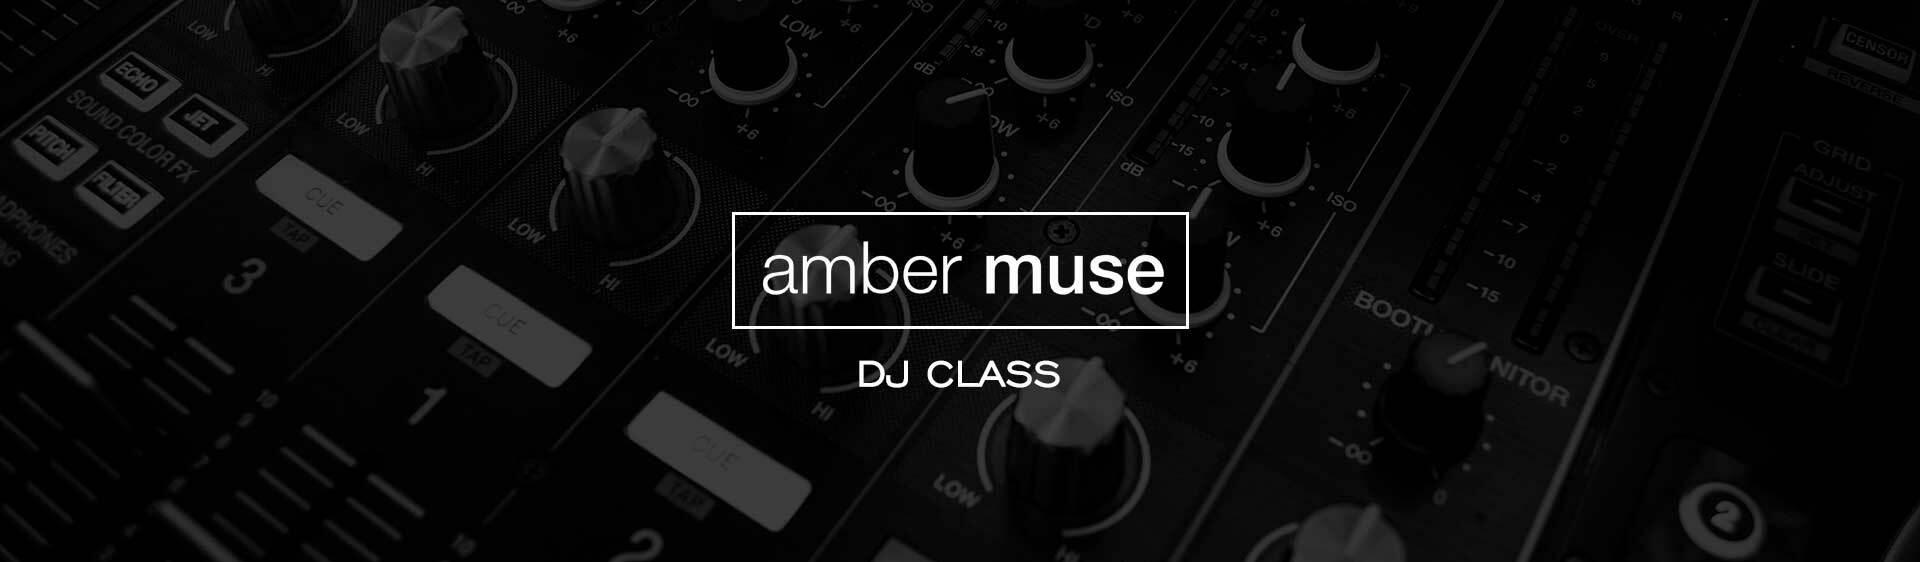 Amber Muse dj Class